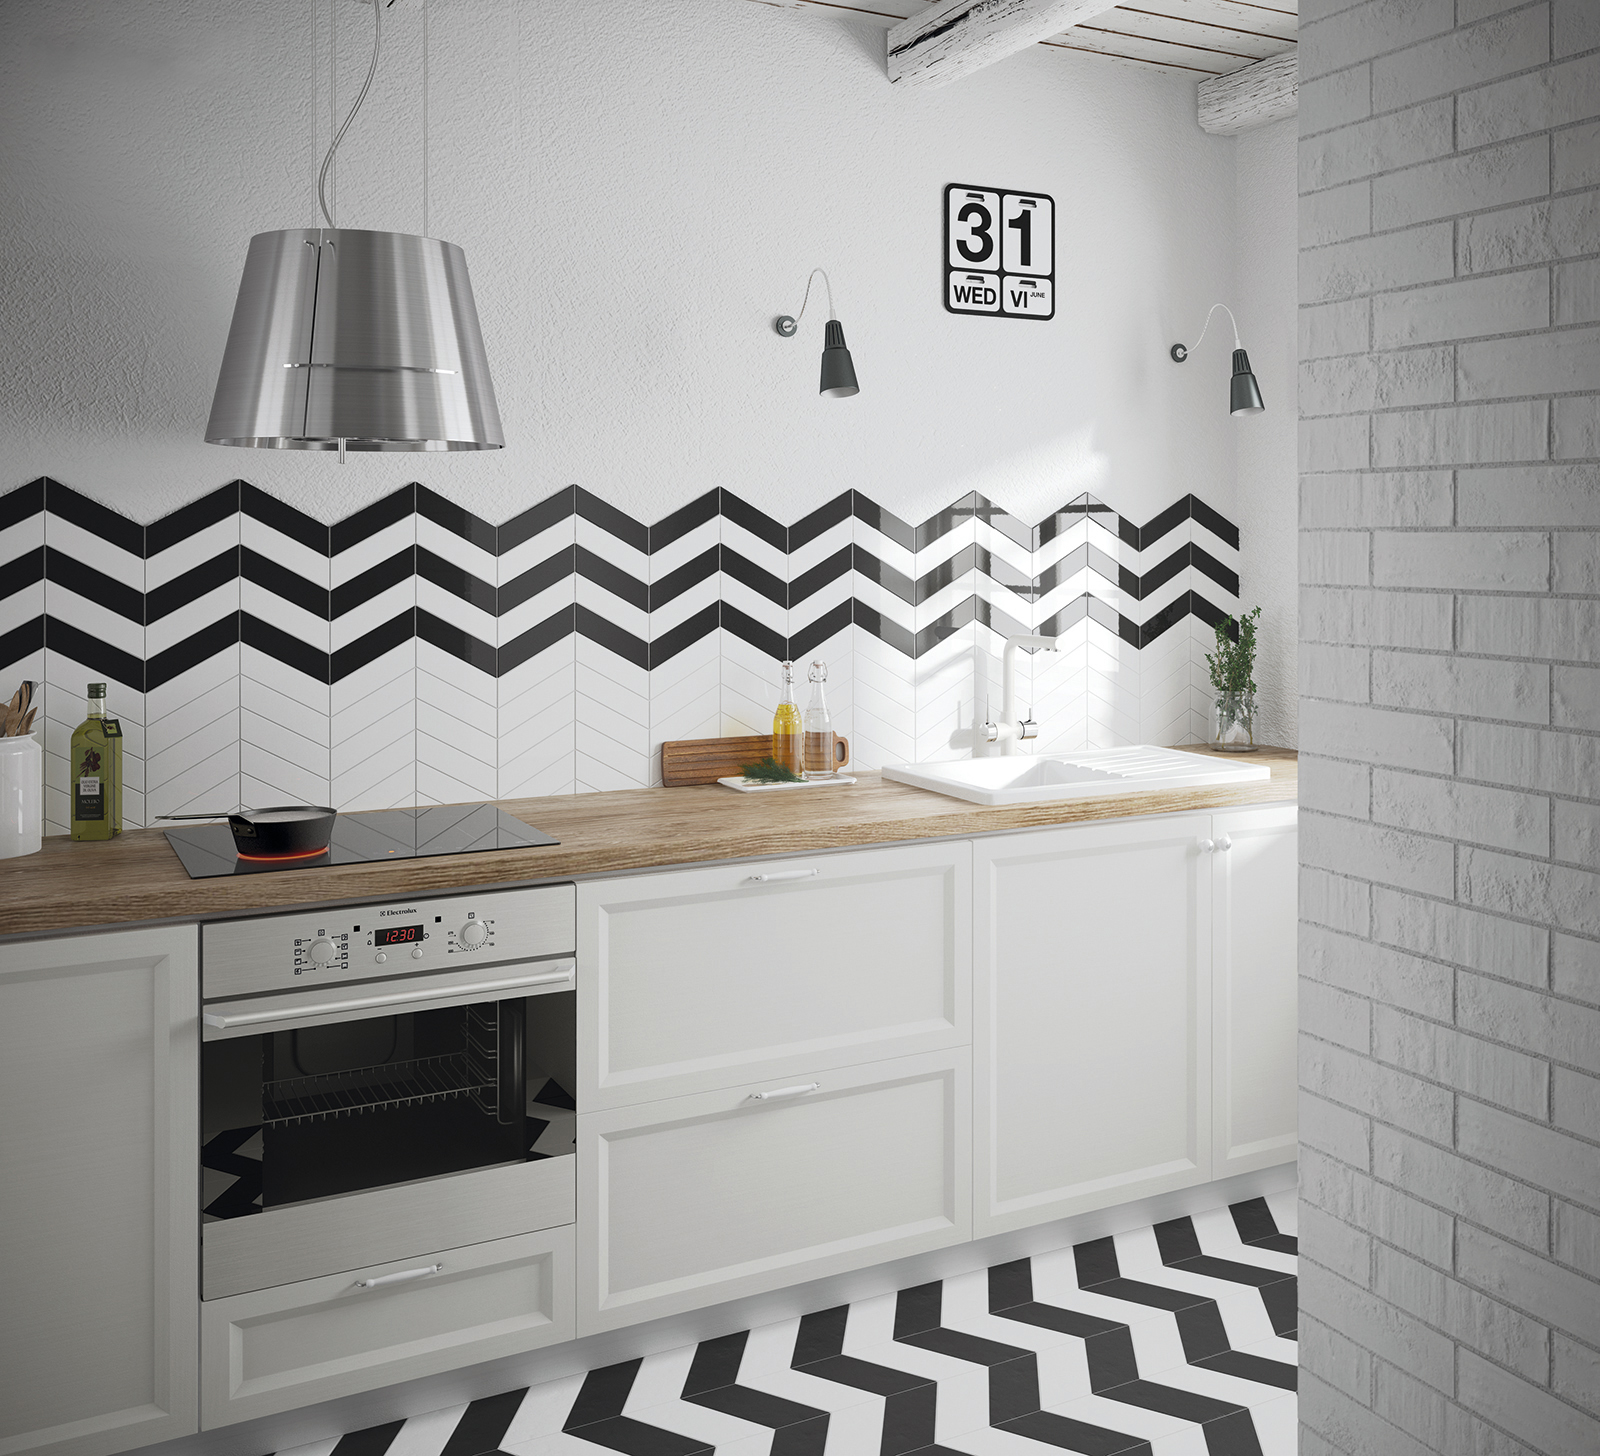 Chevron Wall White & Black 5.2x18.6 cm